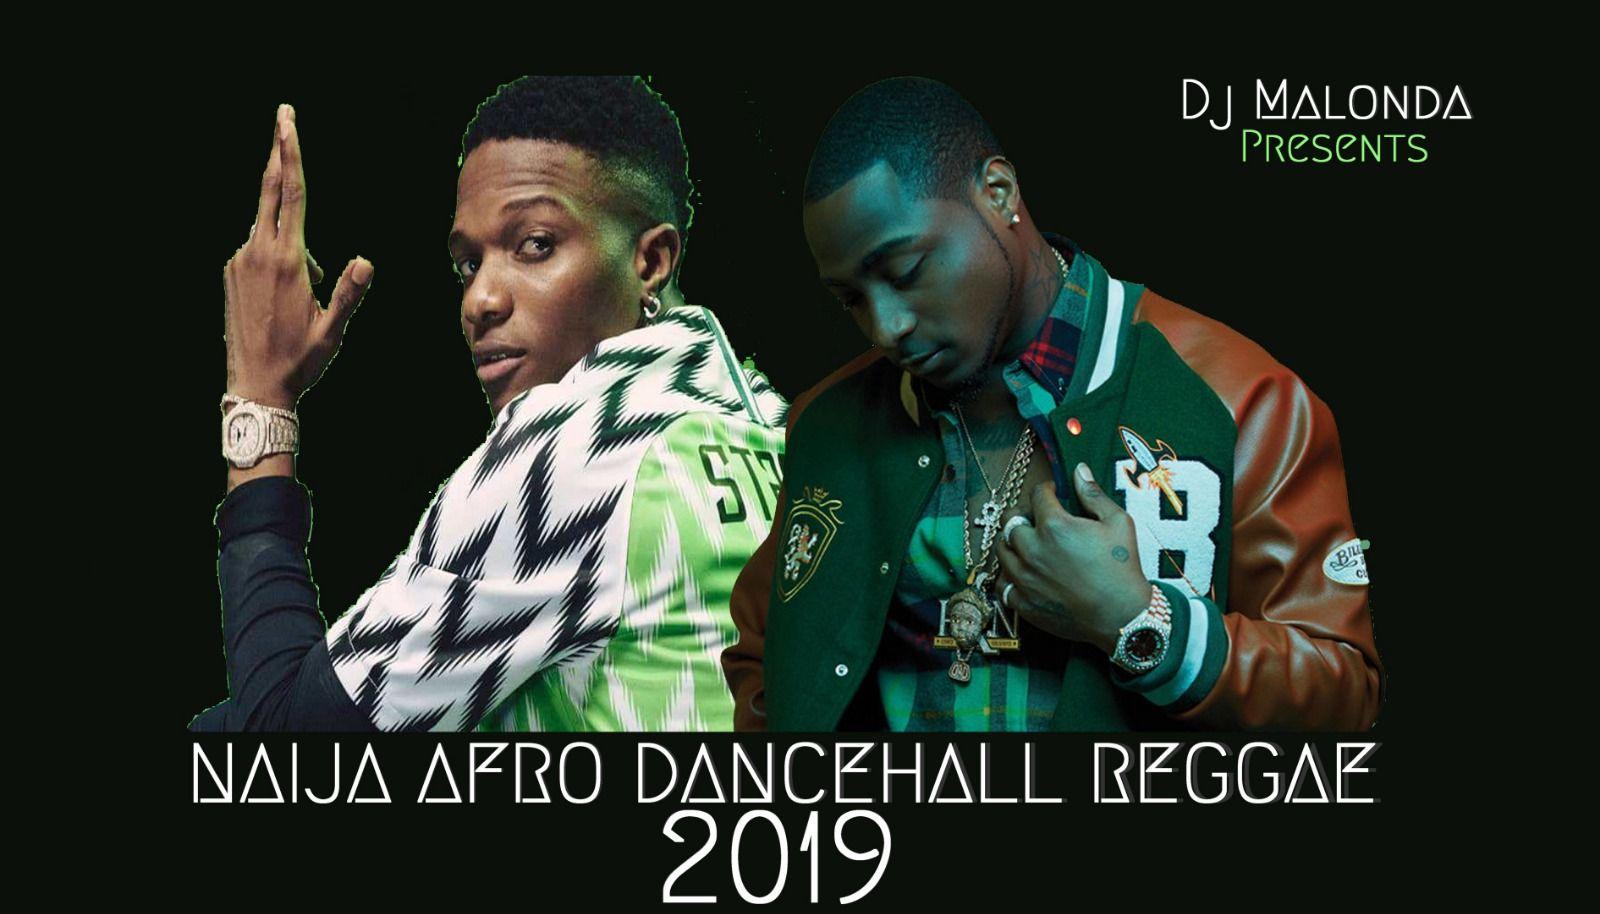 Naija Afro Dancehall Reggae 2019 Mix by Dj Malonda from Dj malonda